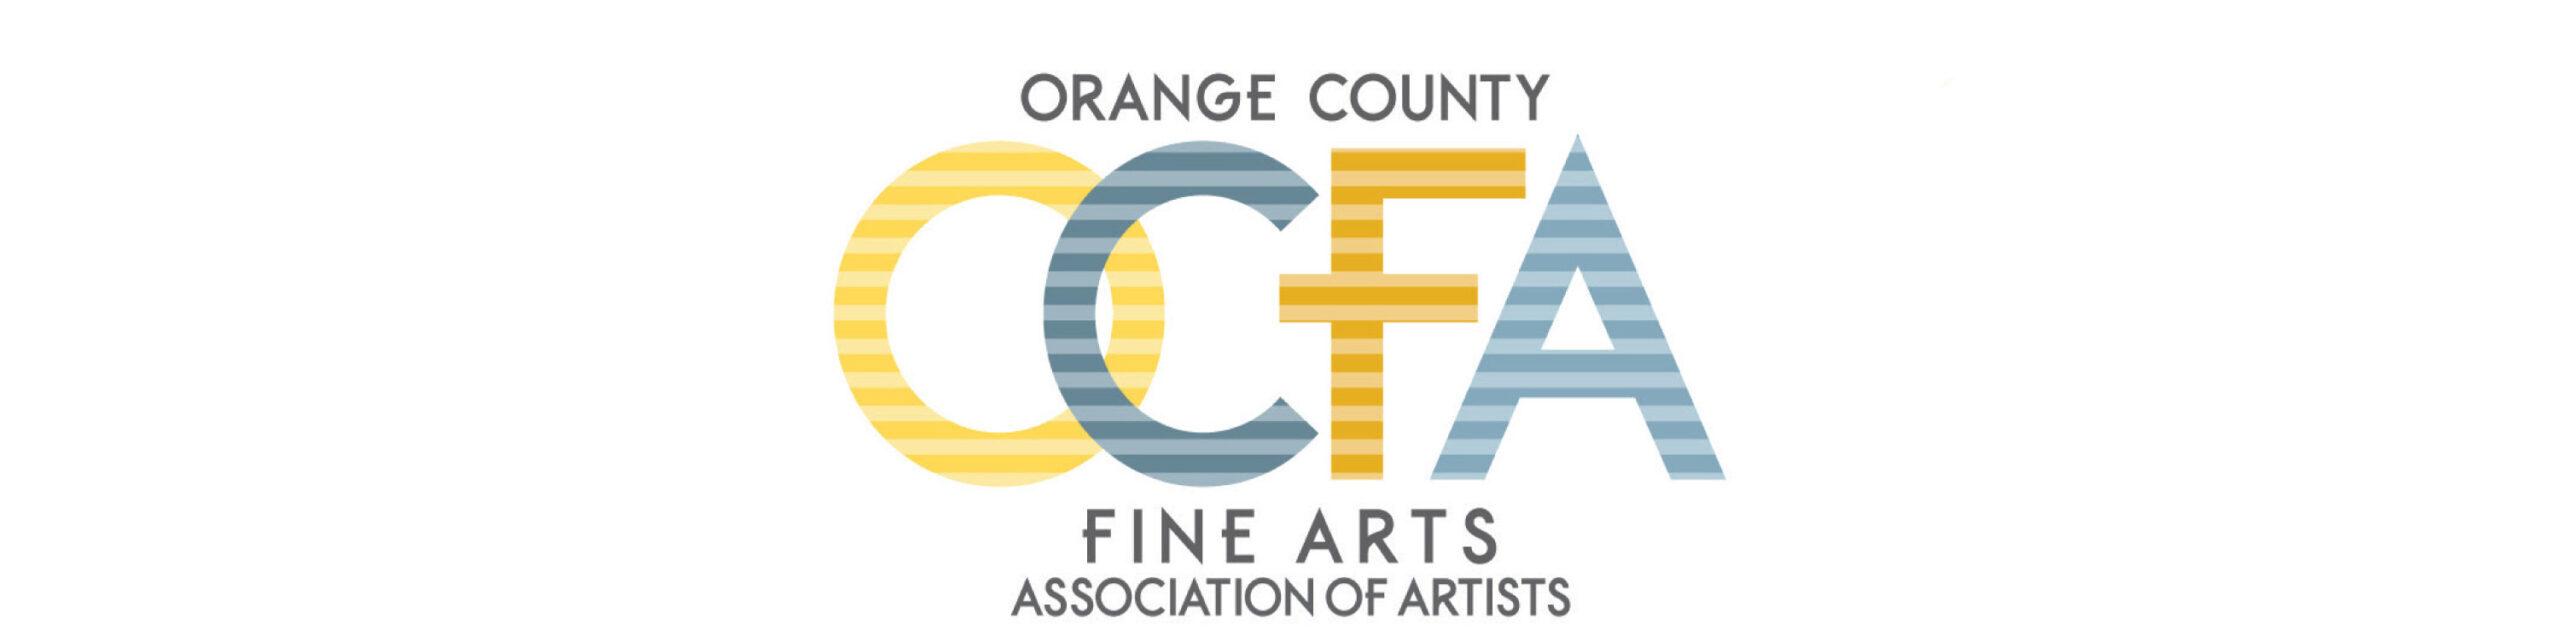 Orange County Fine Arts